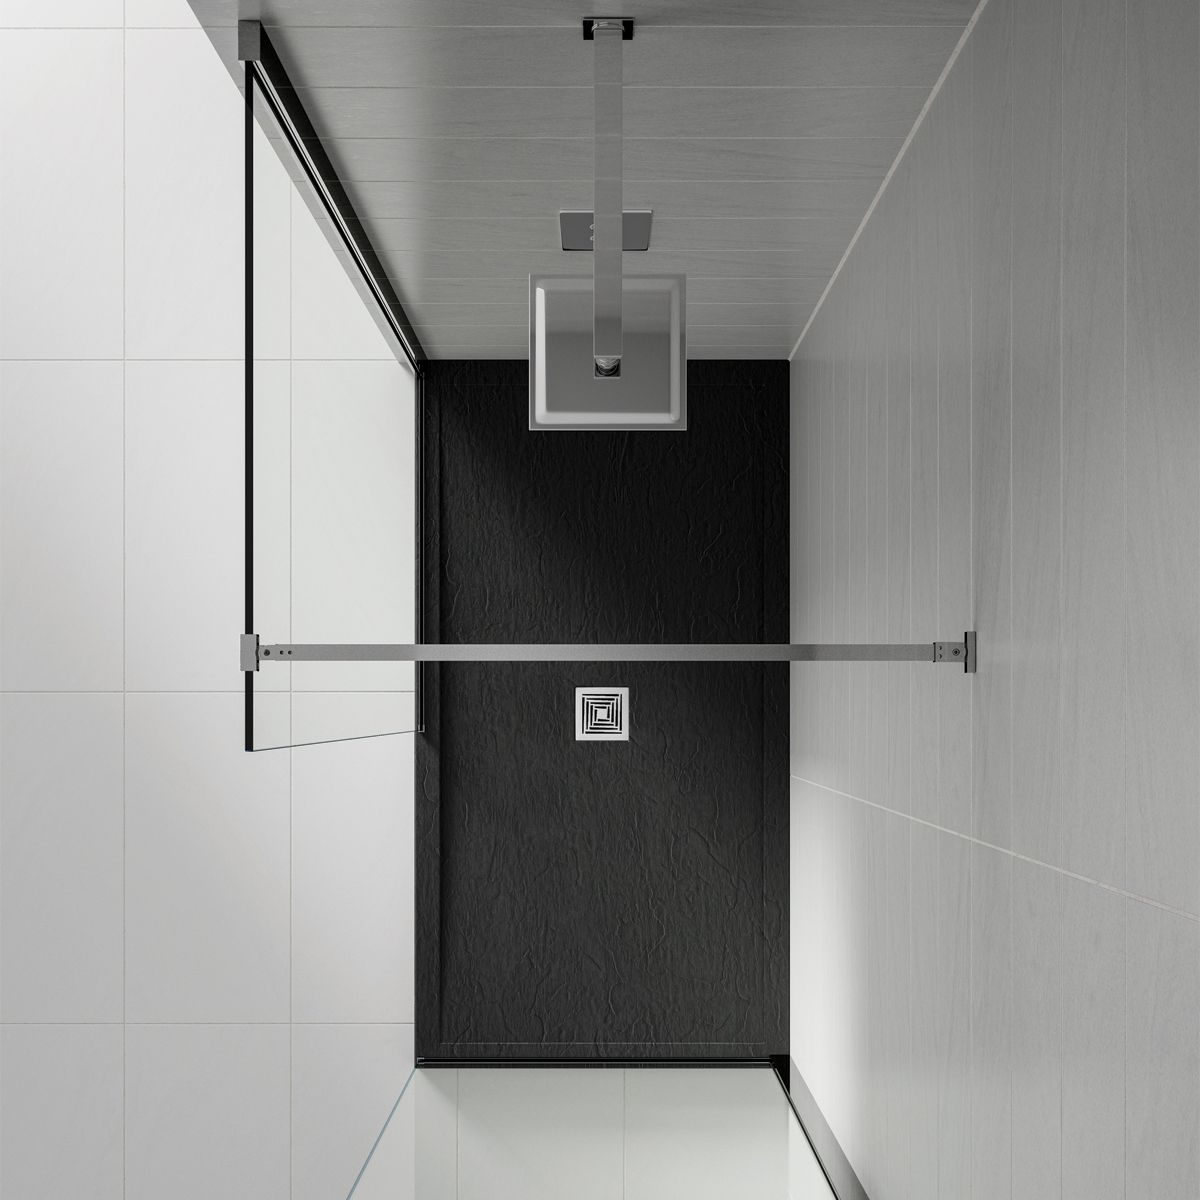 Aquadart Black Slate Shower Tray 1400 x 900 Overhead